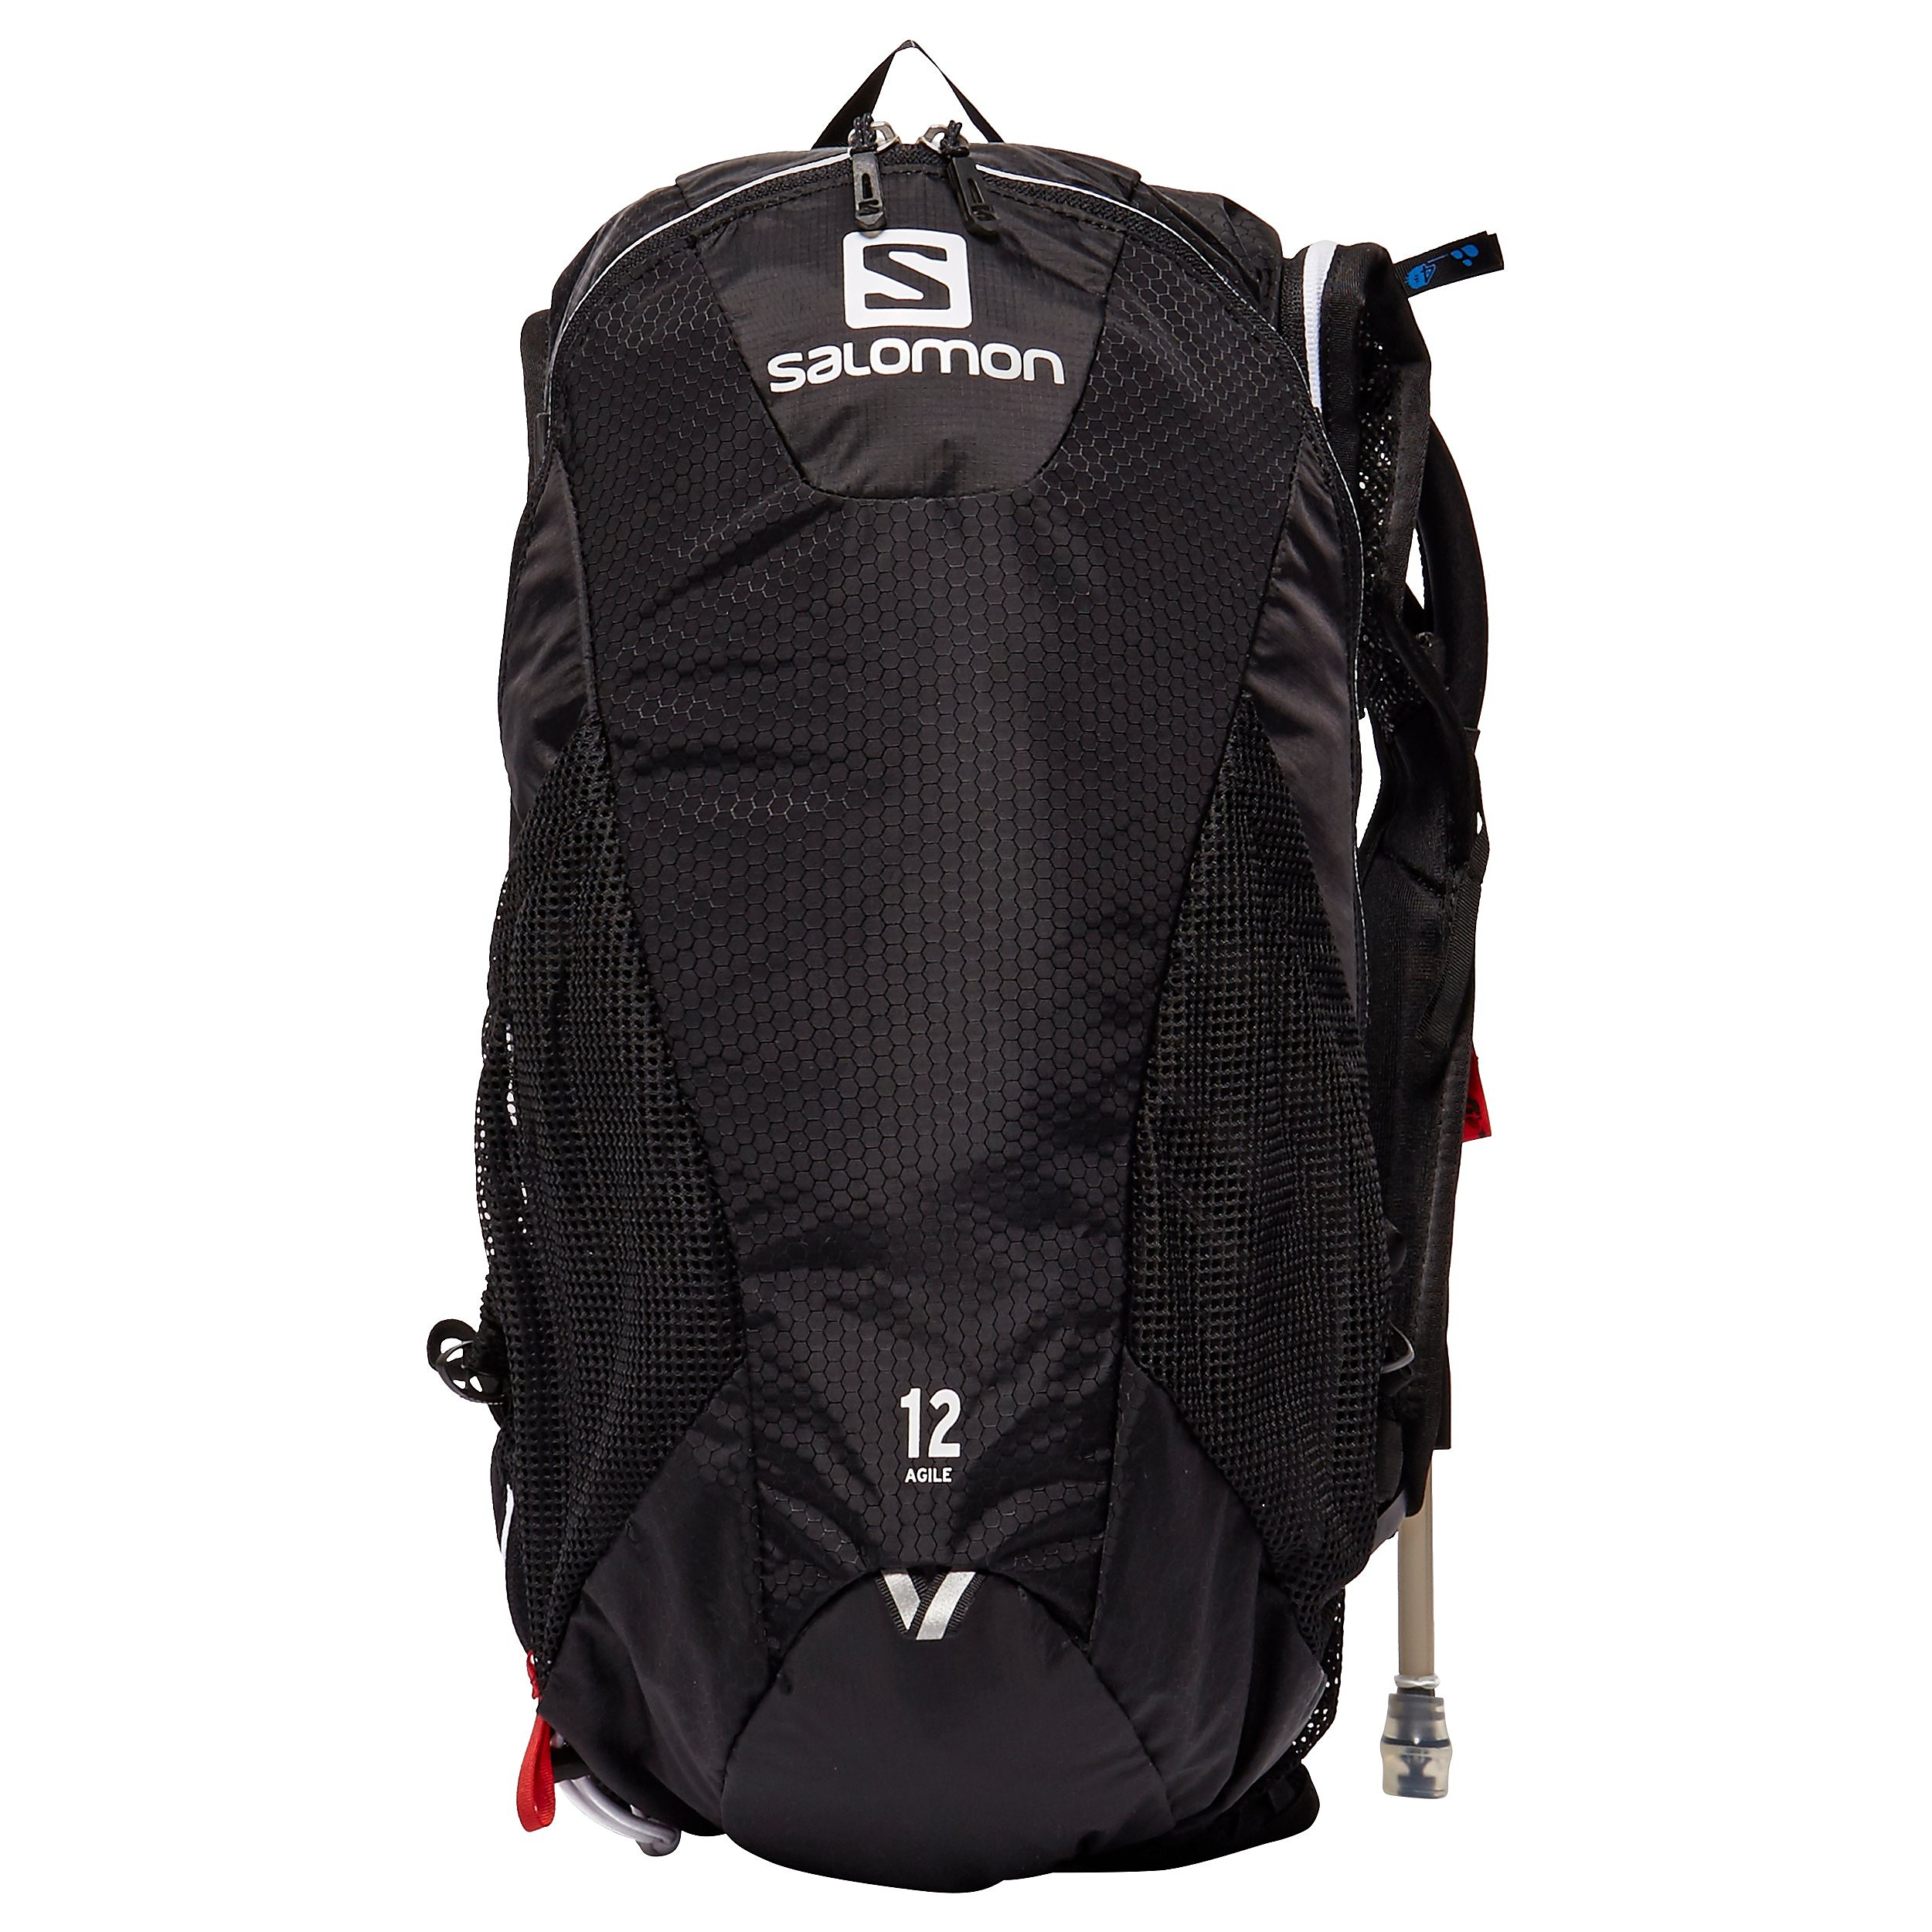 Salomon 12L Capacity Running Backpack